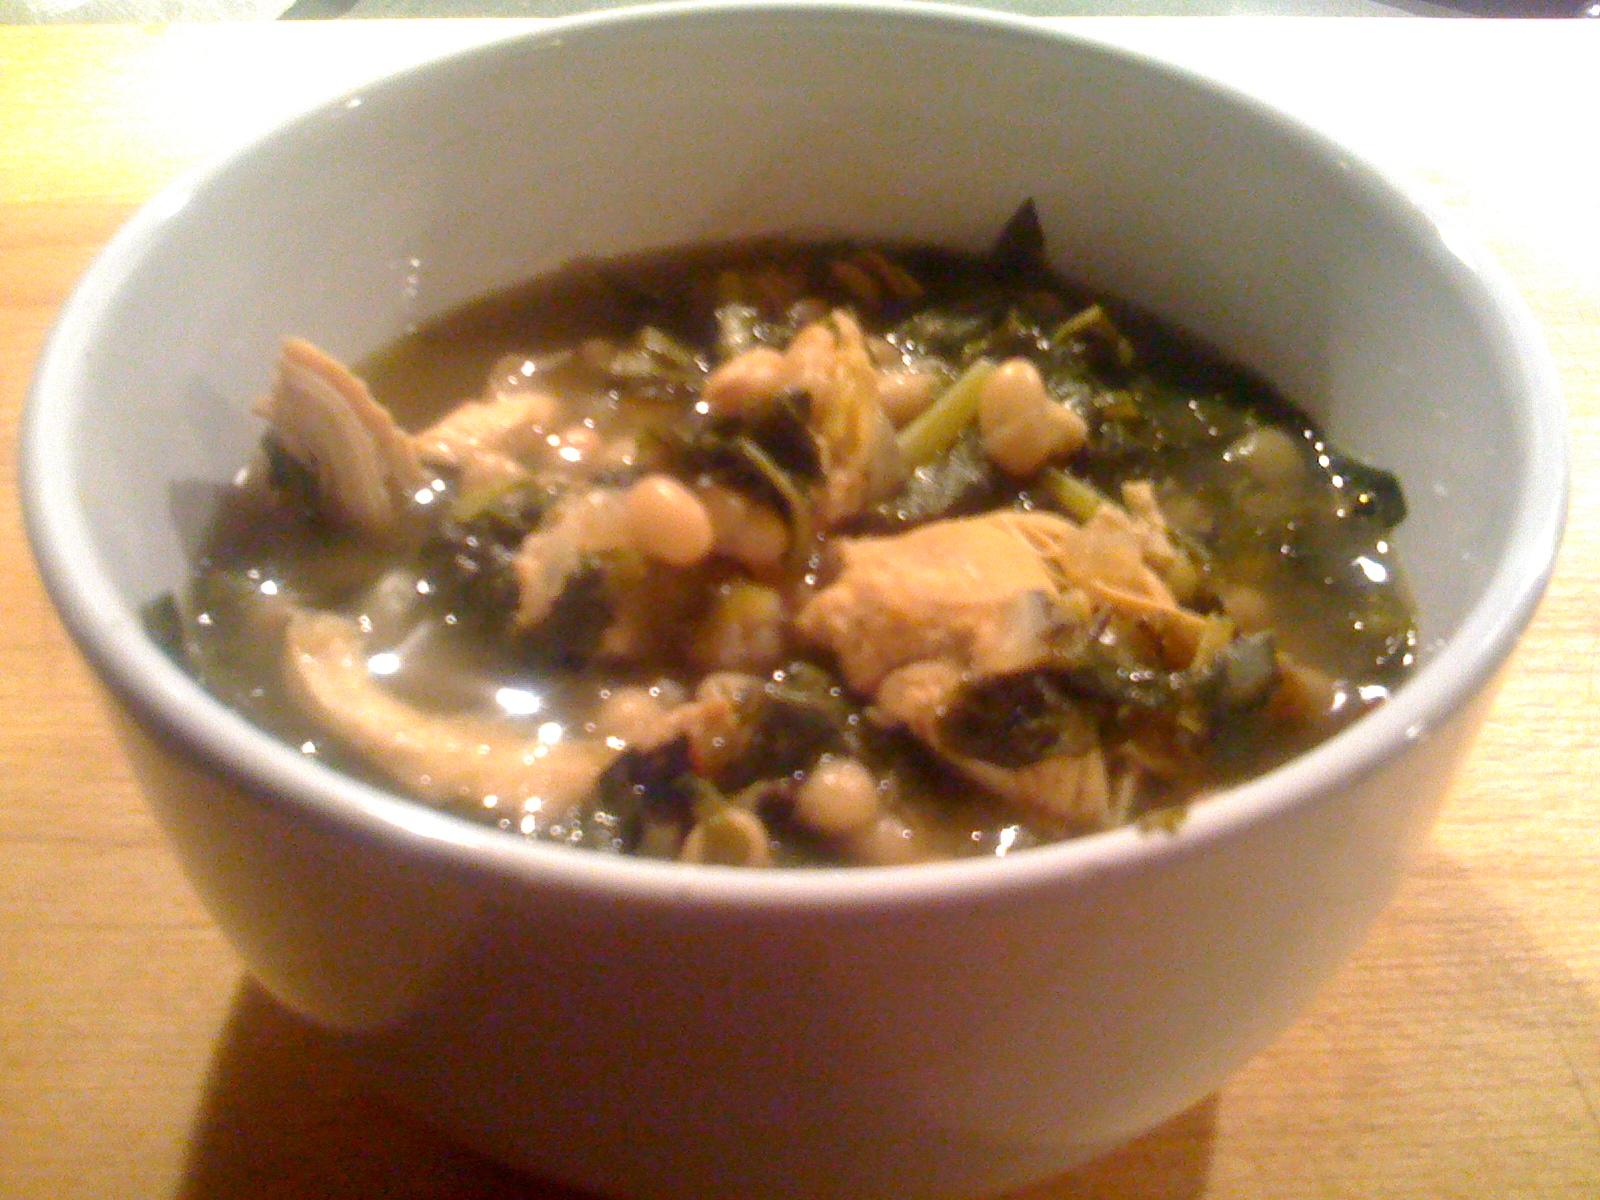 Paula Deen's White Bean Chili with Collard Greens2